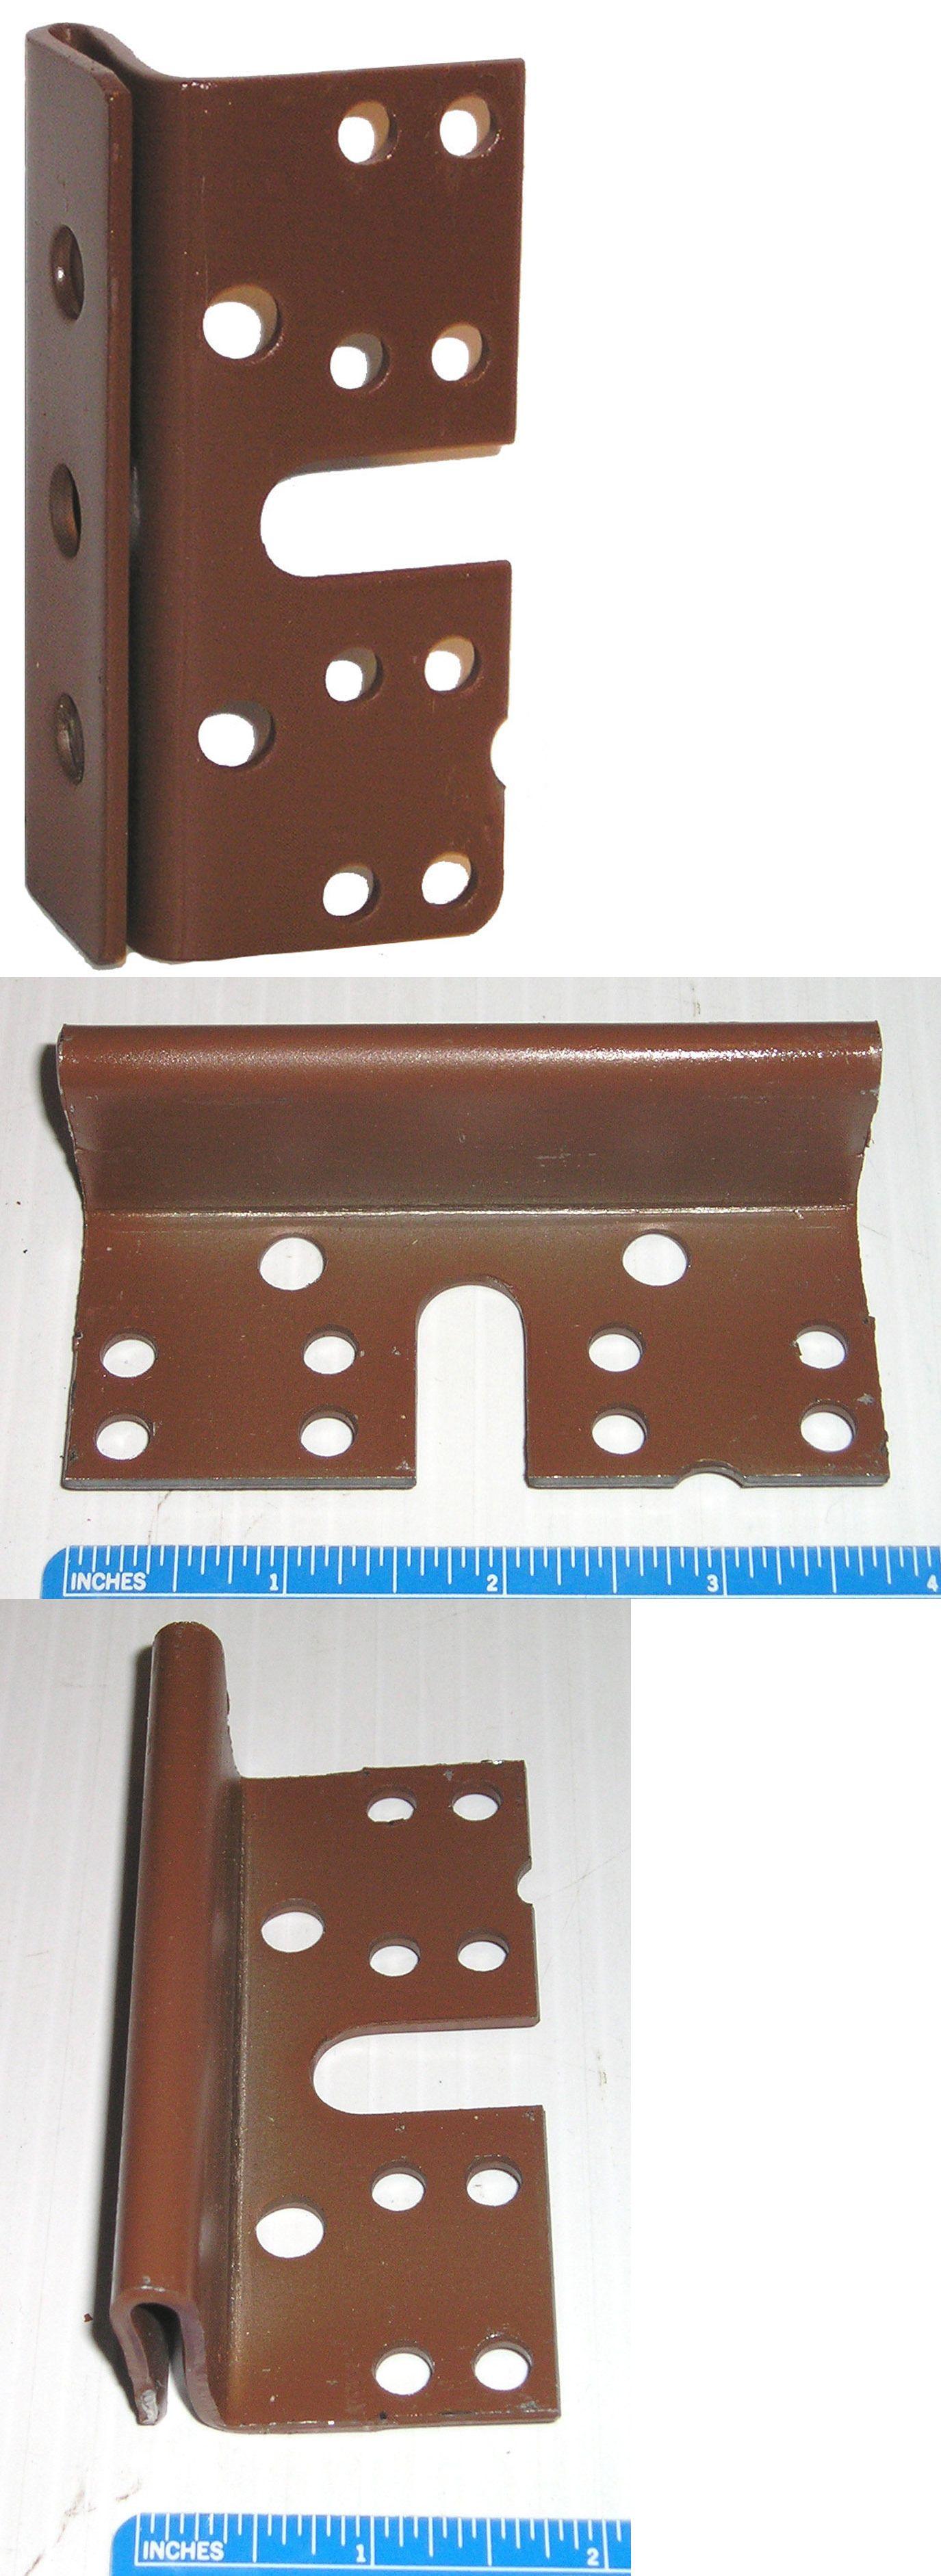 Details about Bed Rail Hanger Bracket Headboard Footboard